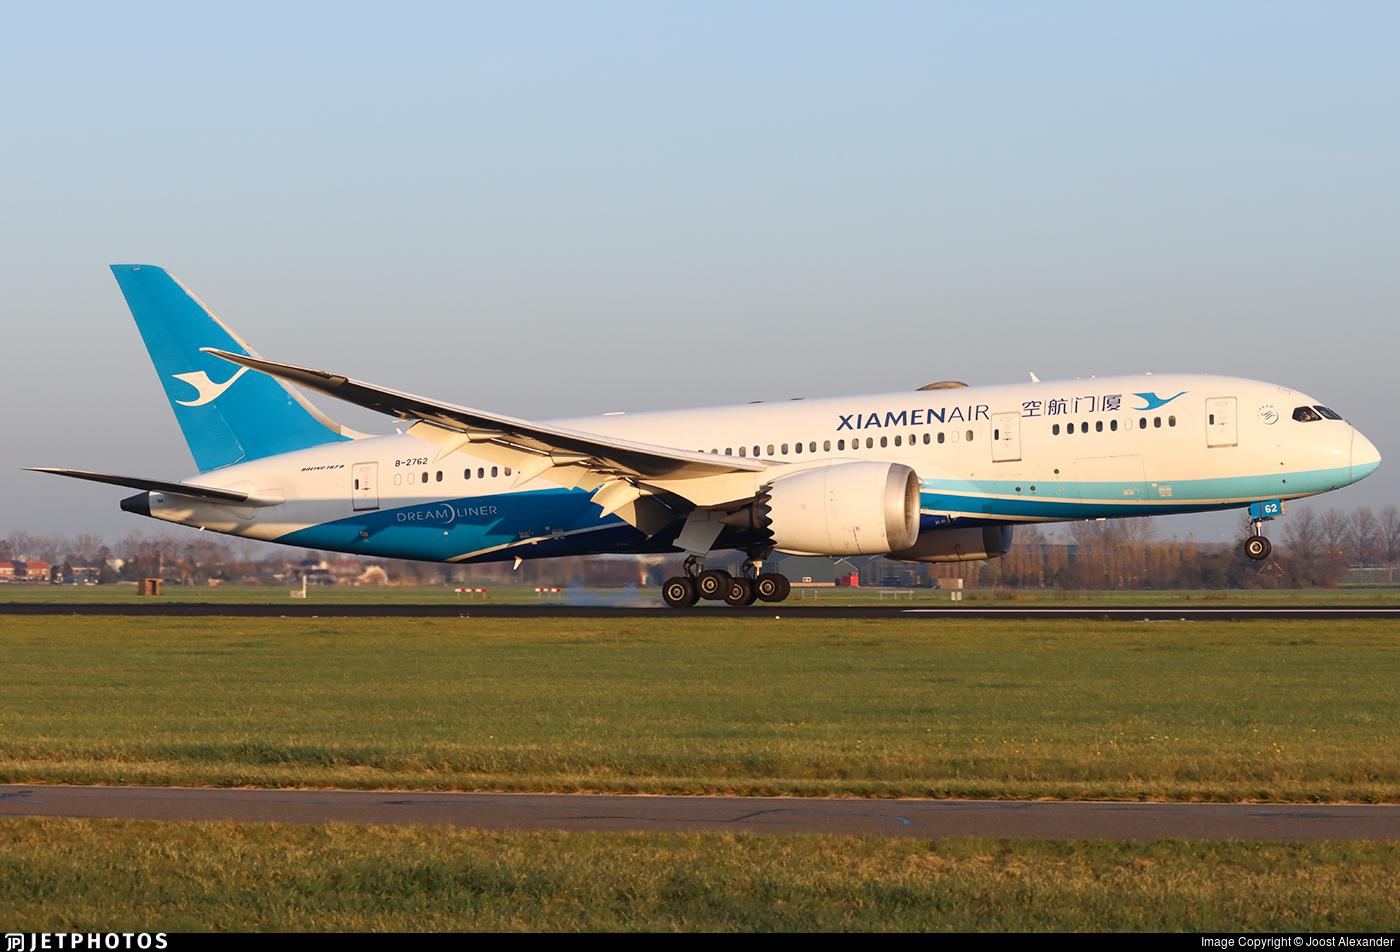 Xiamen Air China 787 Dreamliner